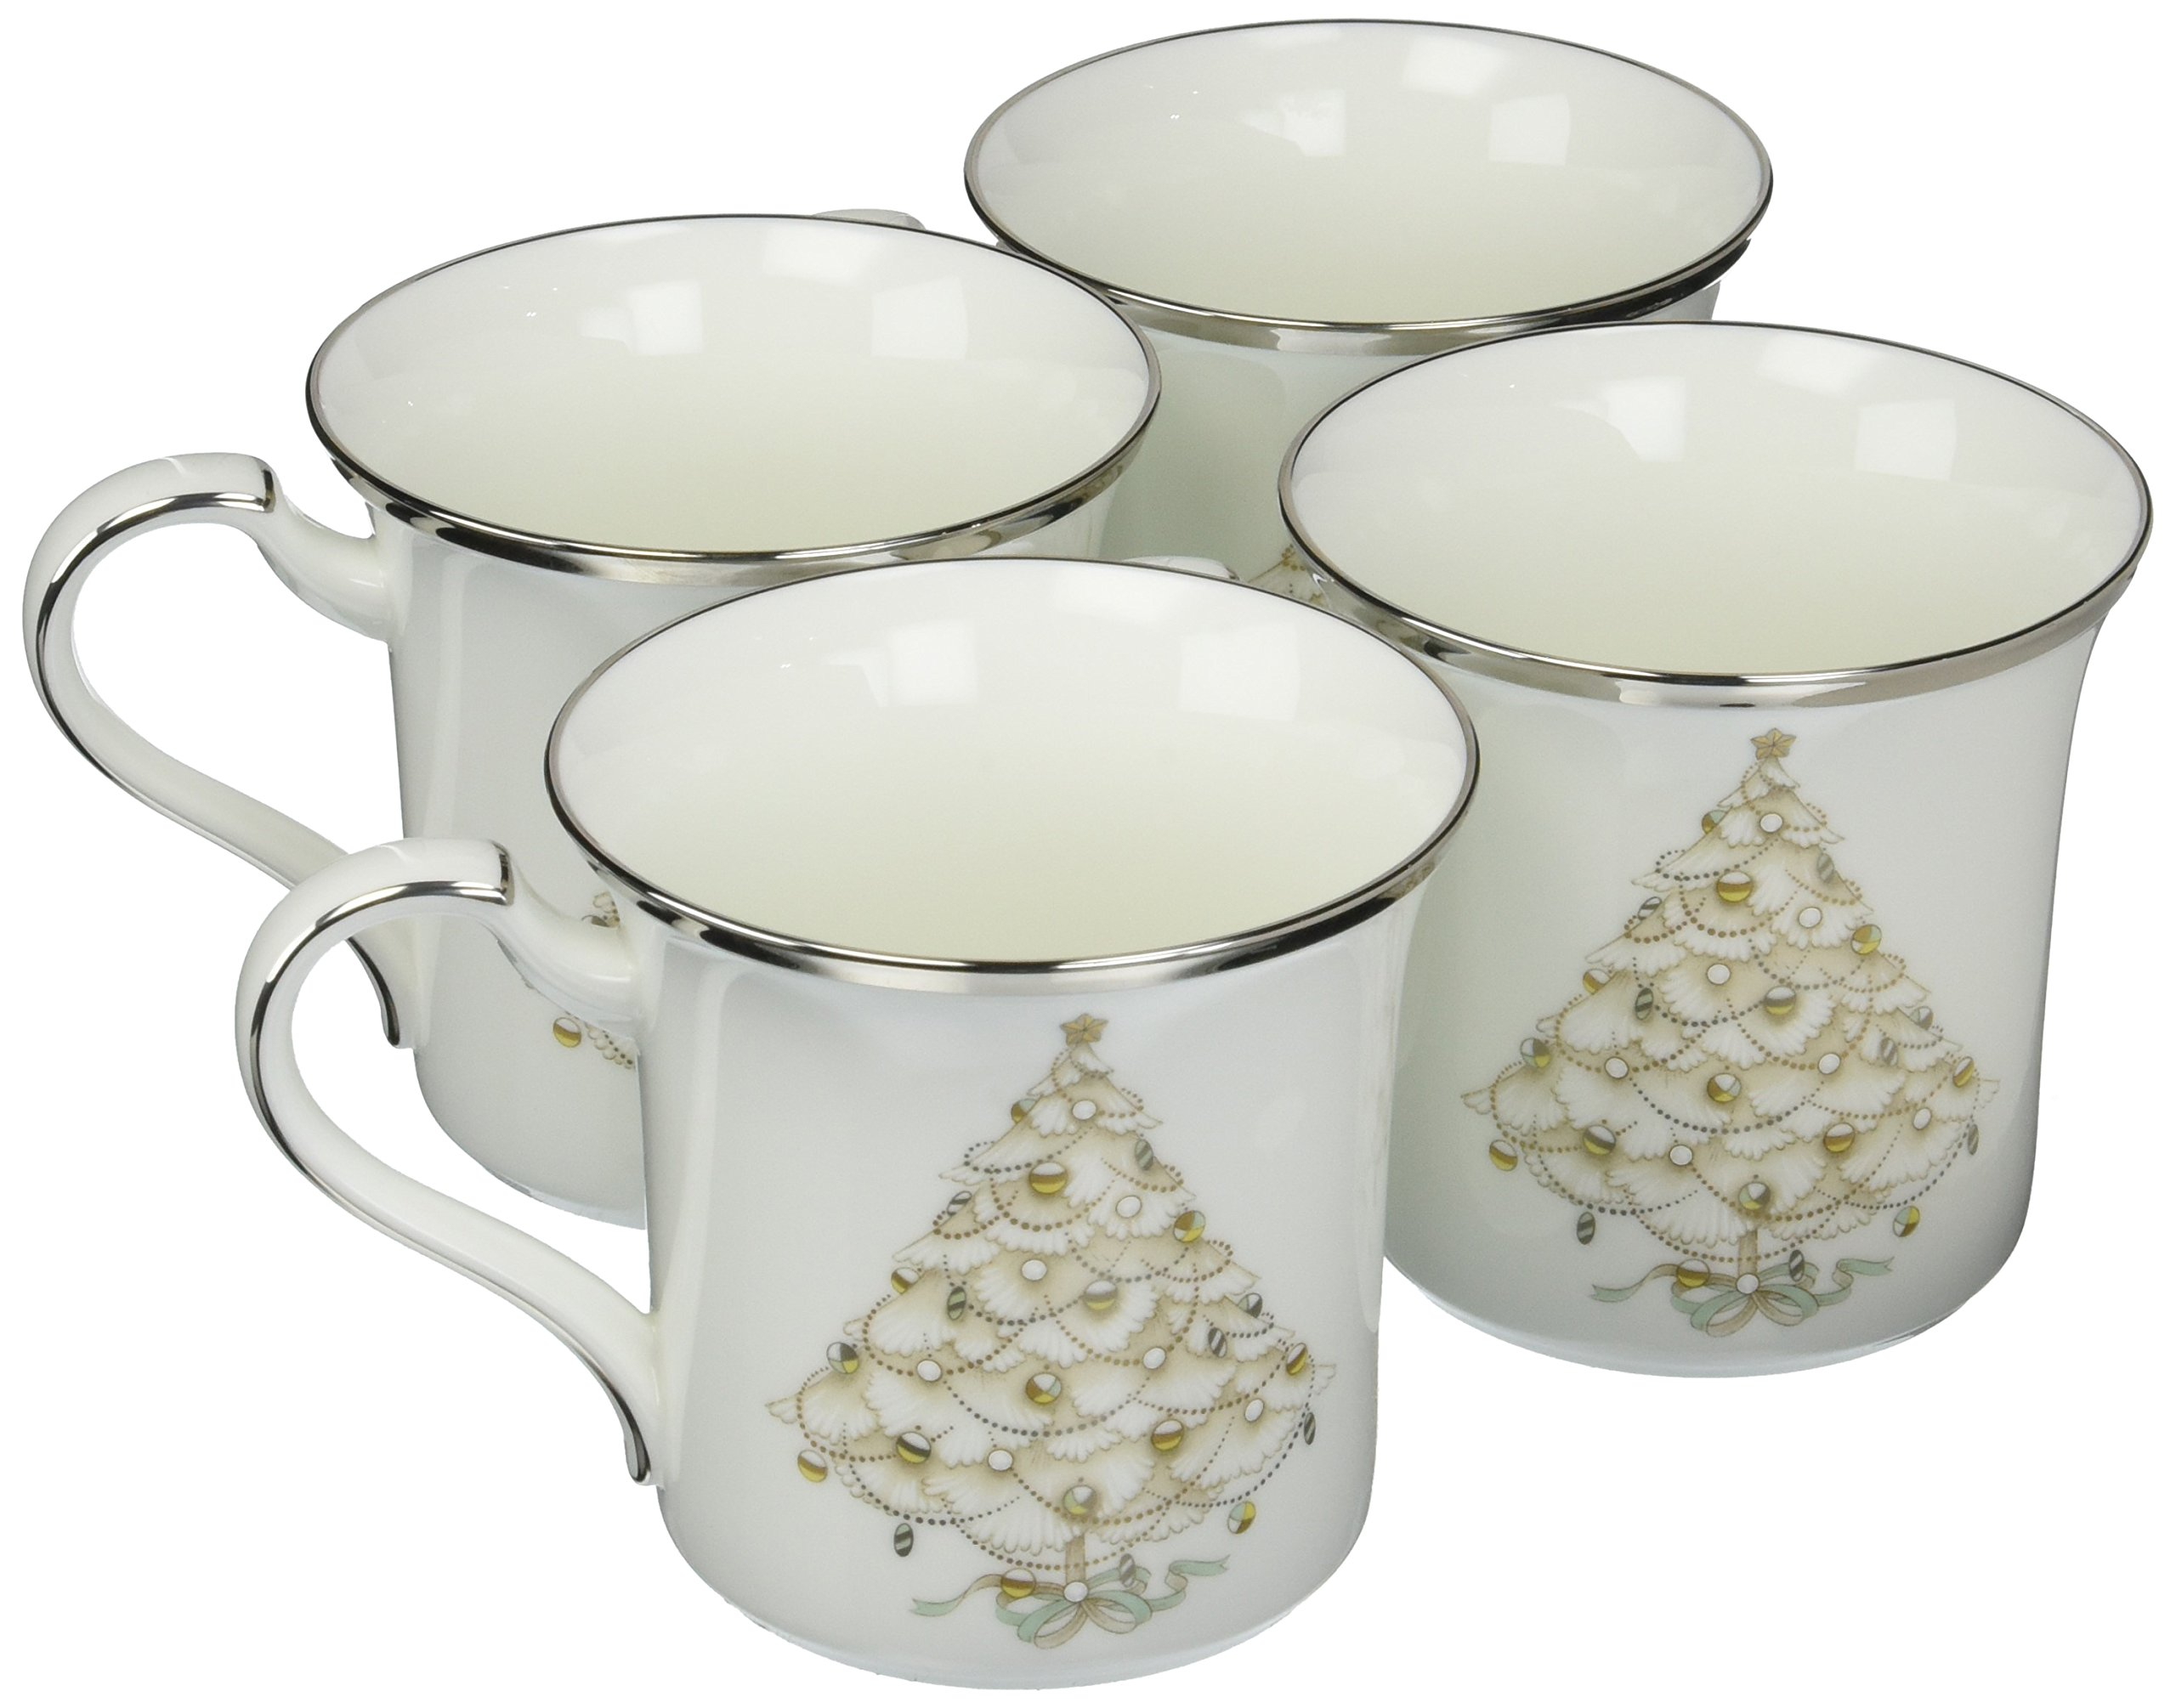 Noritake Palace Christmas Holiday Accent Mug, Platinum, Set of 4